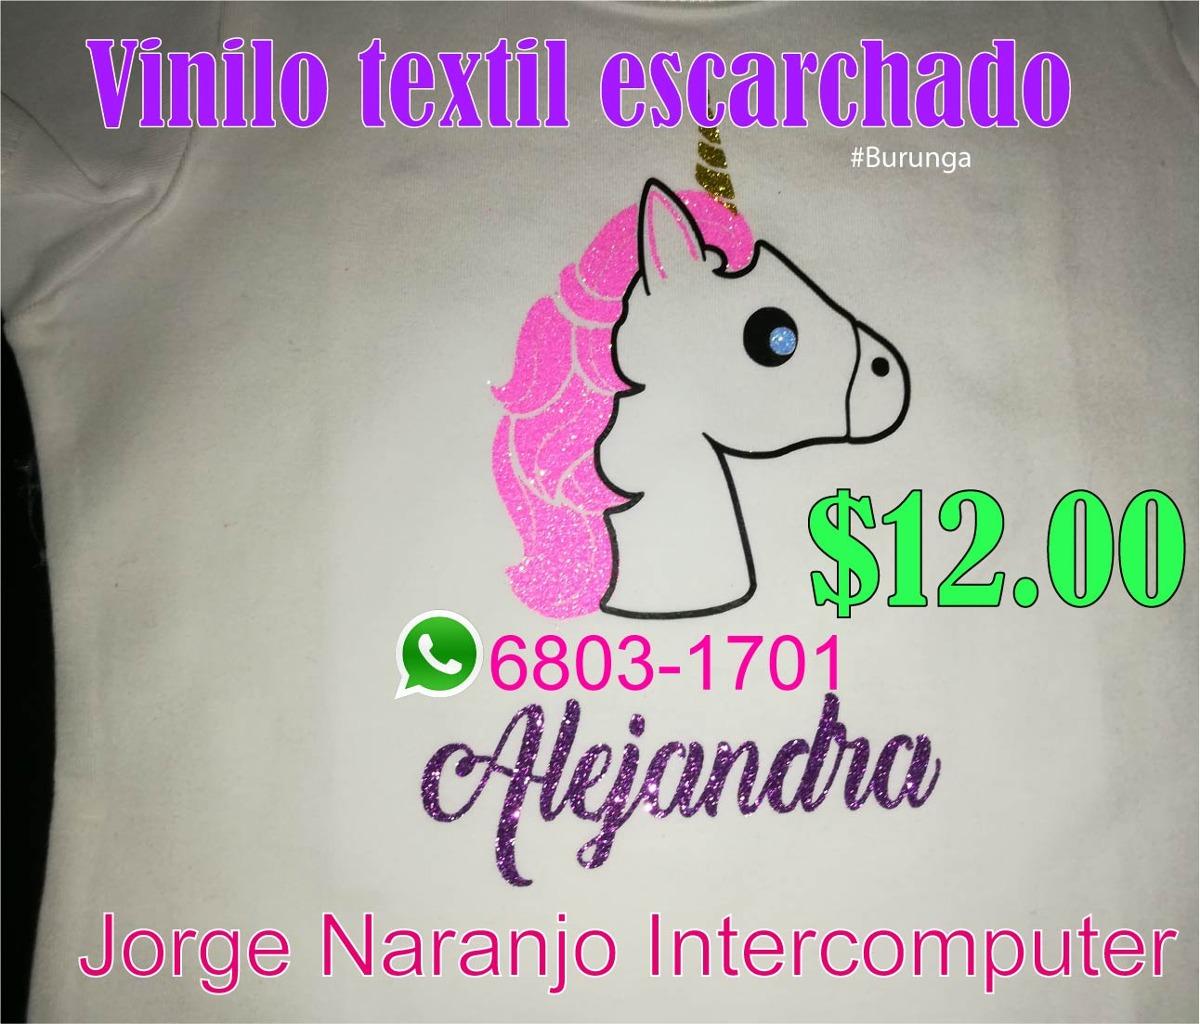 Impresiones En Vinilo Textil Escarchado Unicornio - Niñas - - en ...